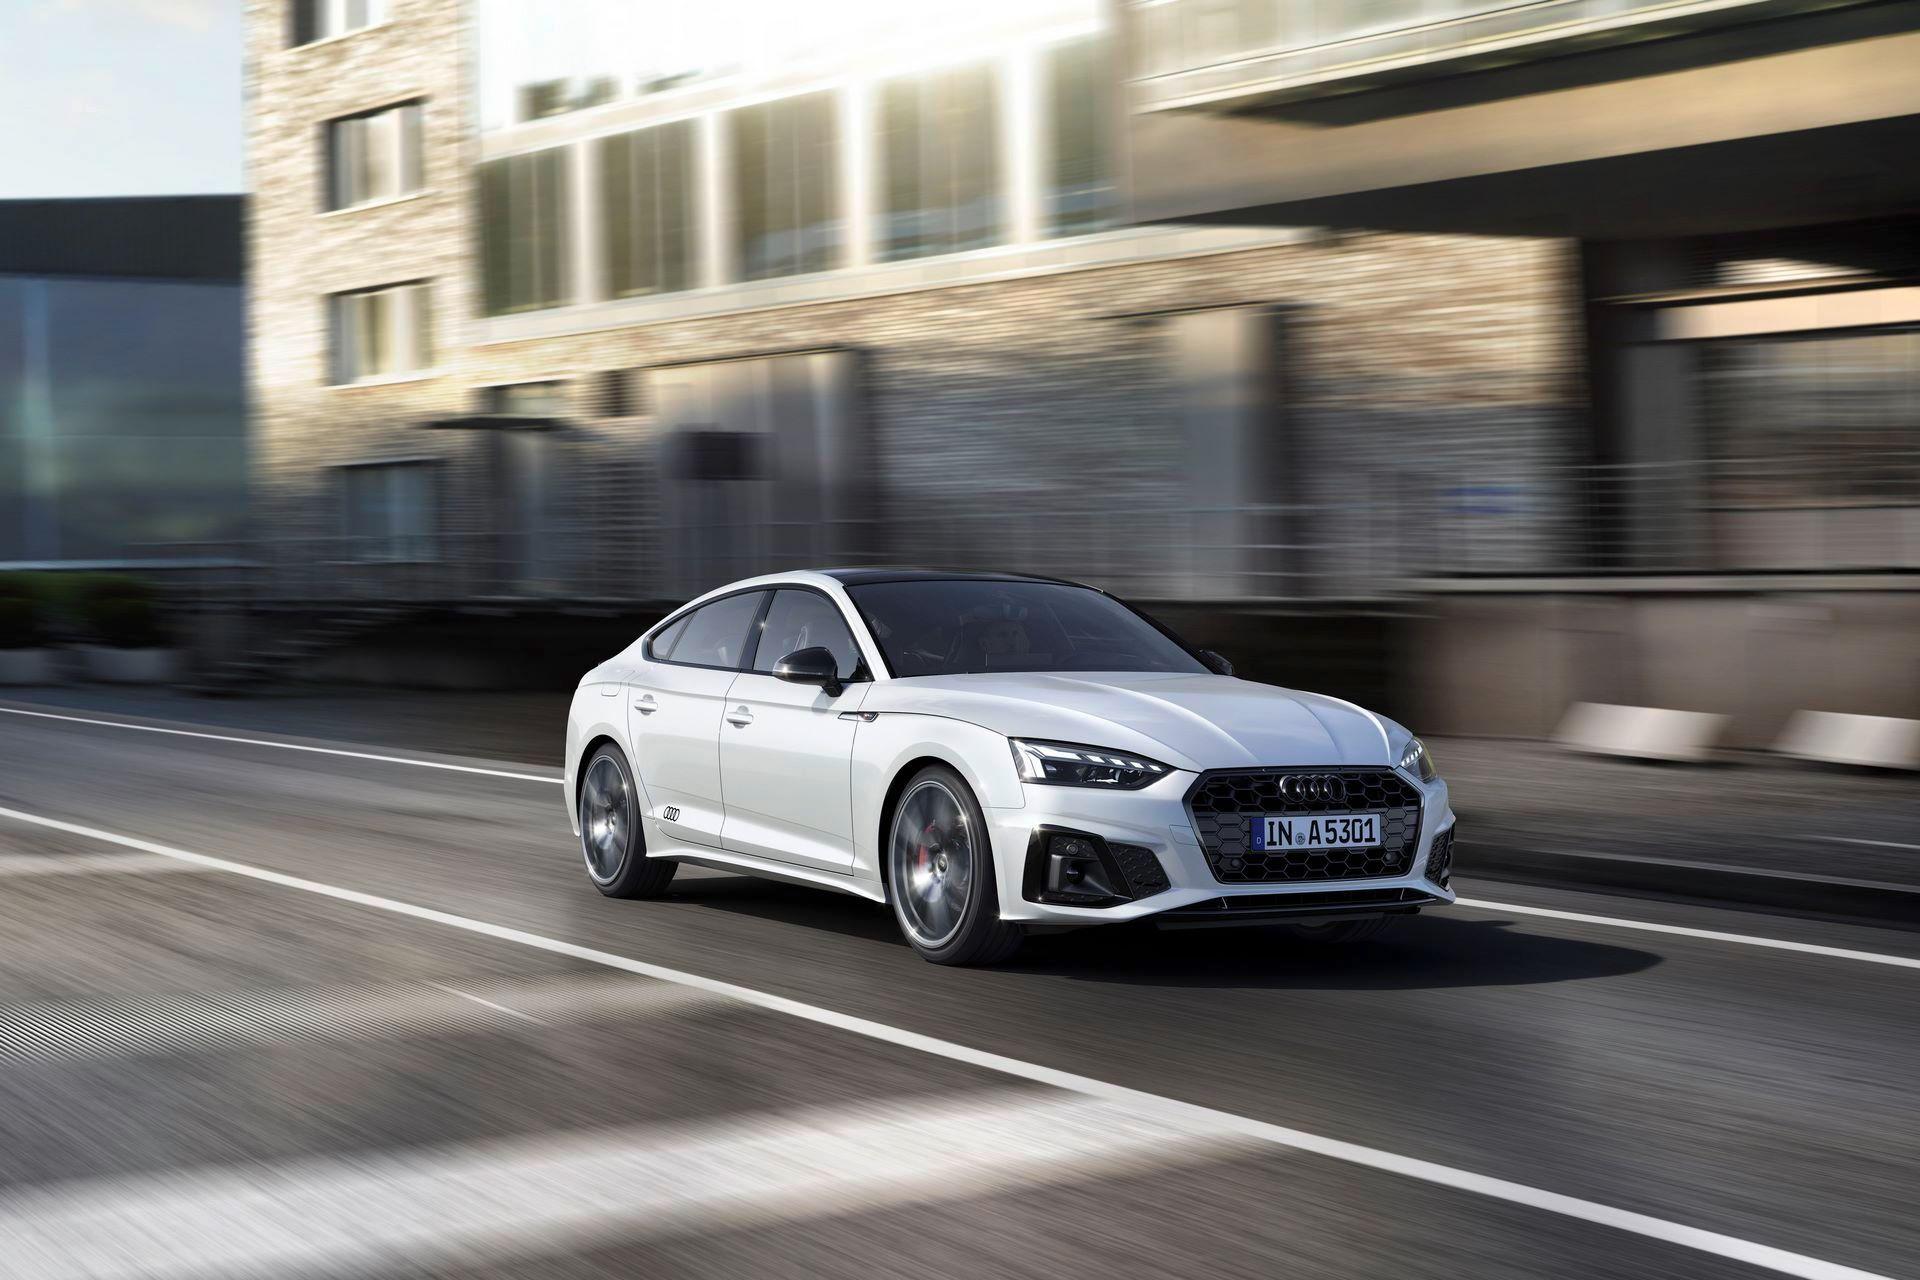 Audi-A4-A5-Q7-Q8-Competition-And-Competition-Plus-Trims-70